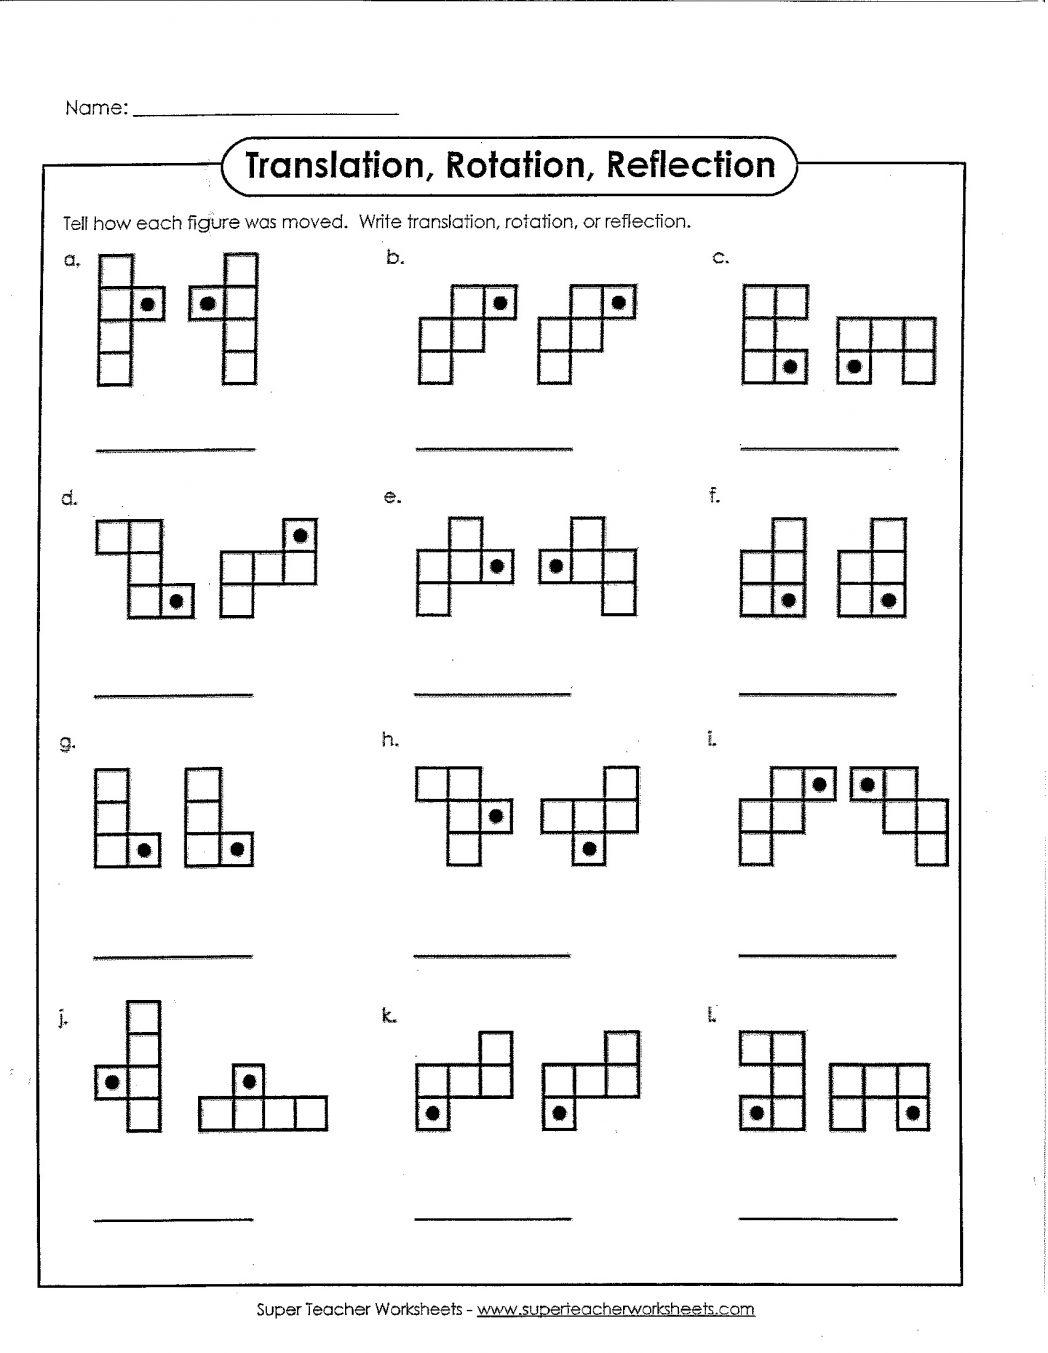 Rotation Reflection Translation Worksheets